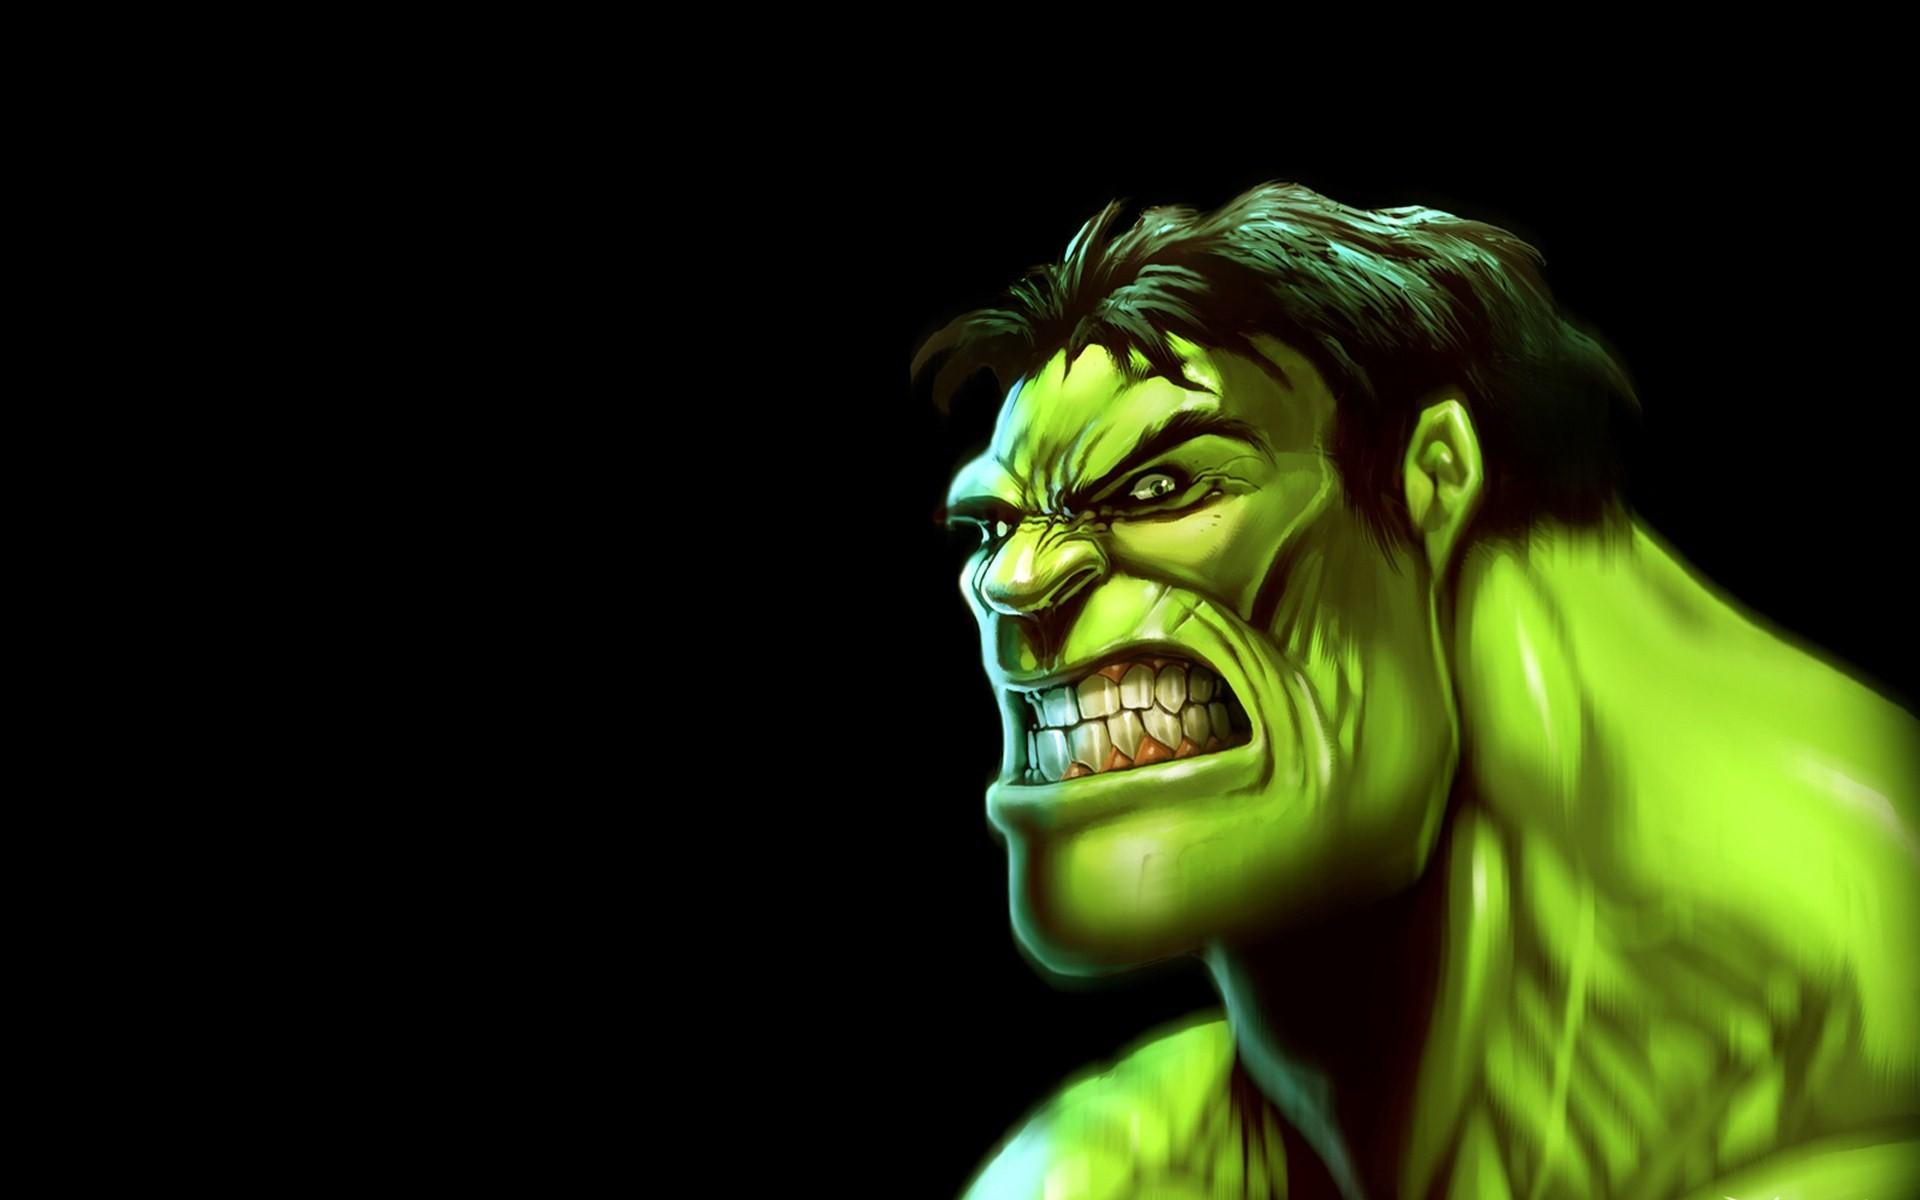 … Wallpaper Hulk Wallpaper